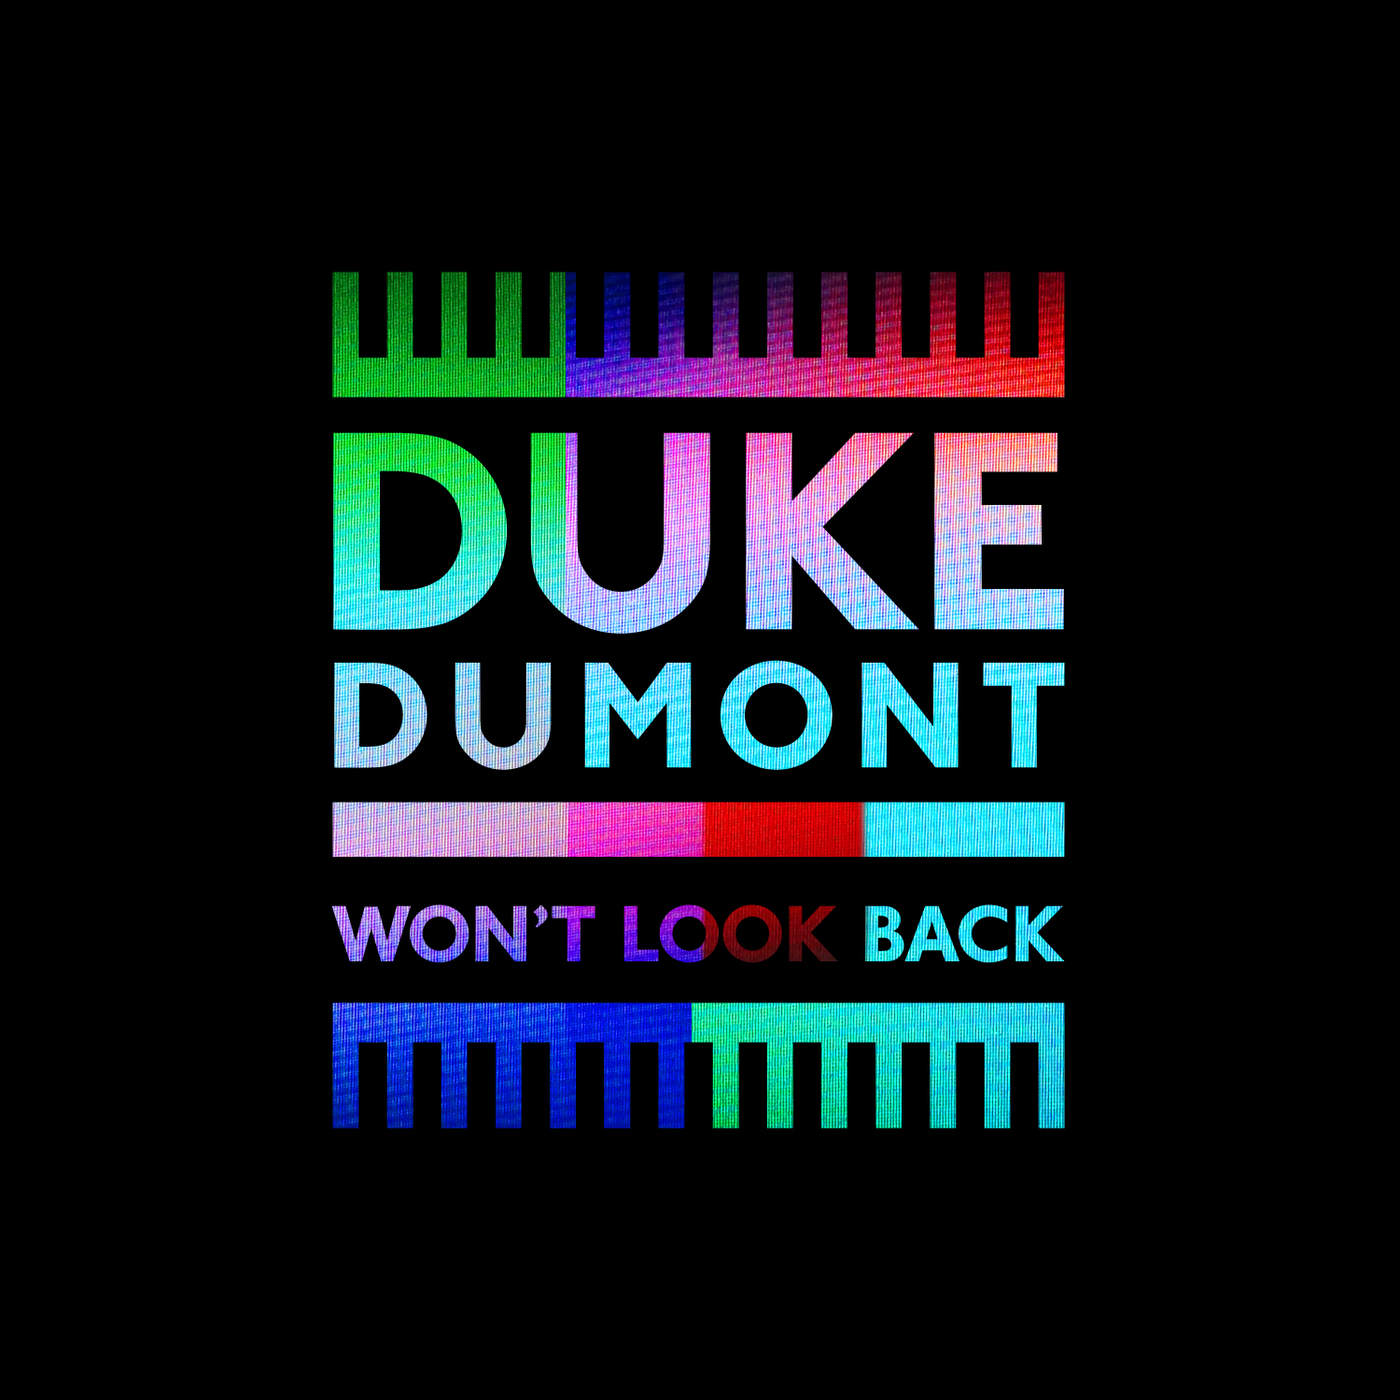 Duke Dumont - Won't Look Back - Single (Radio Edit) Cover